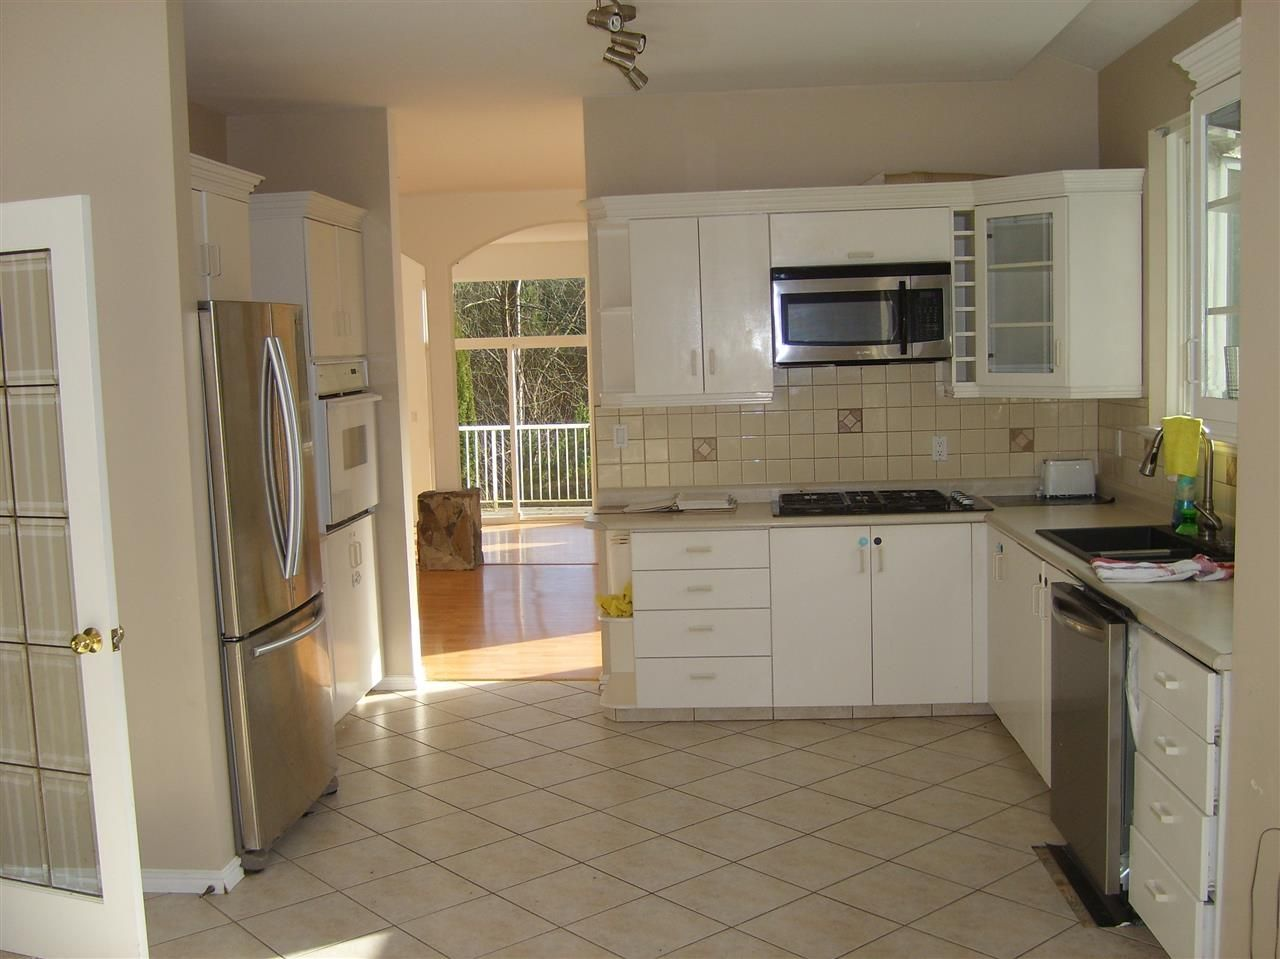 Photo 4: Photos: 28640 123 Avenue in Maple Ridge: Northeast House for sale : MLS®# R2419989